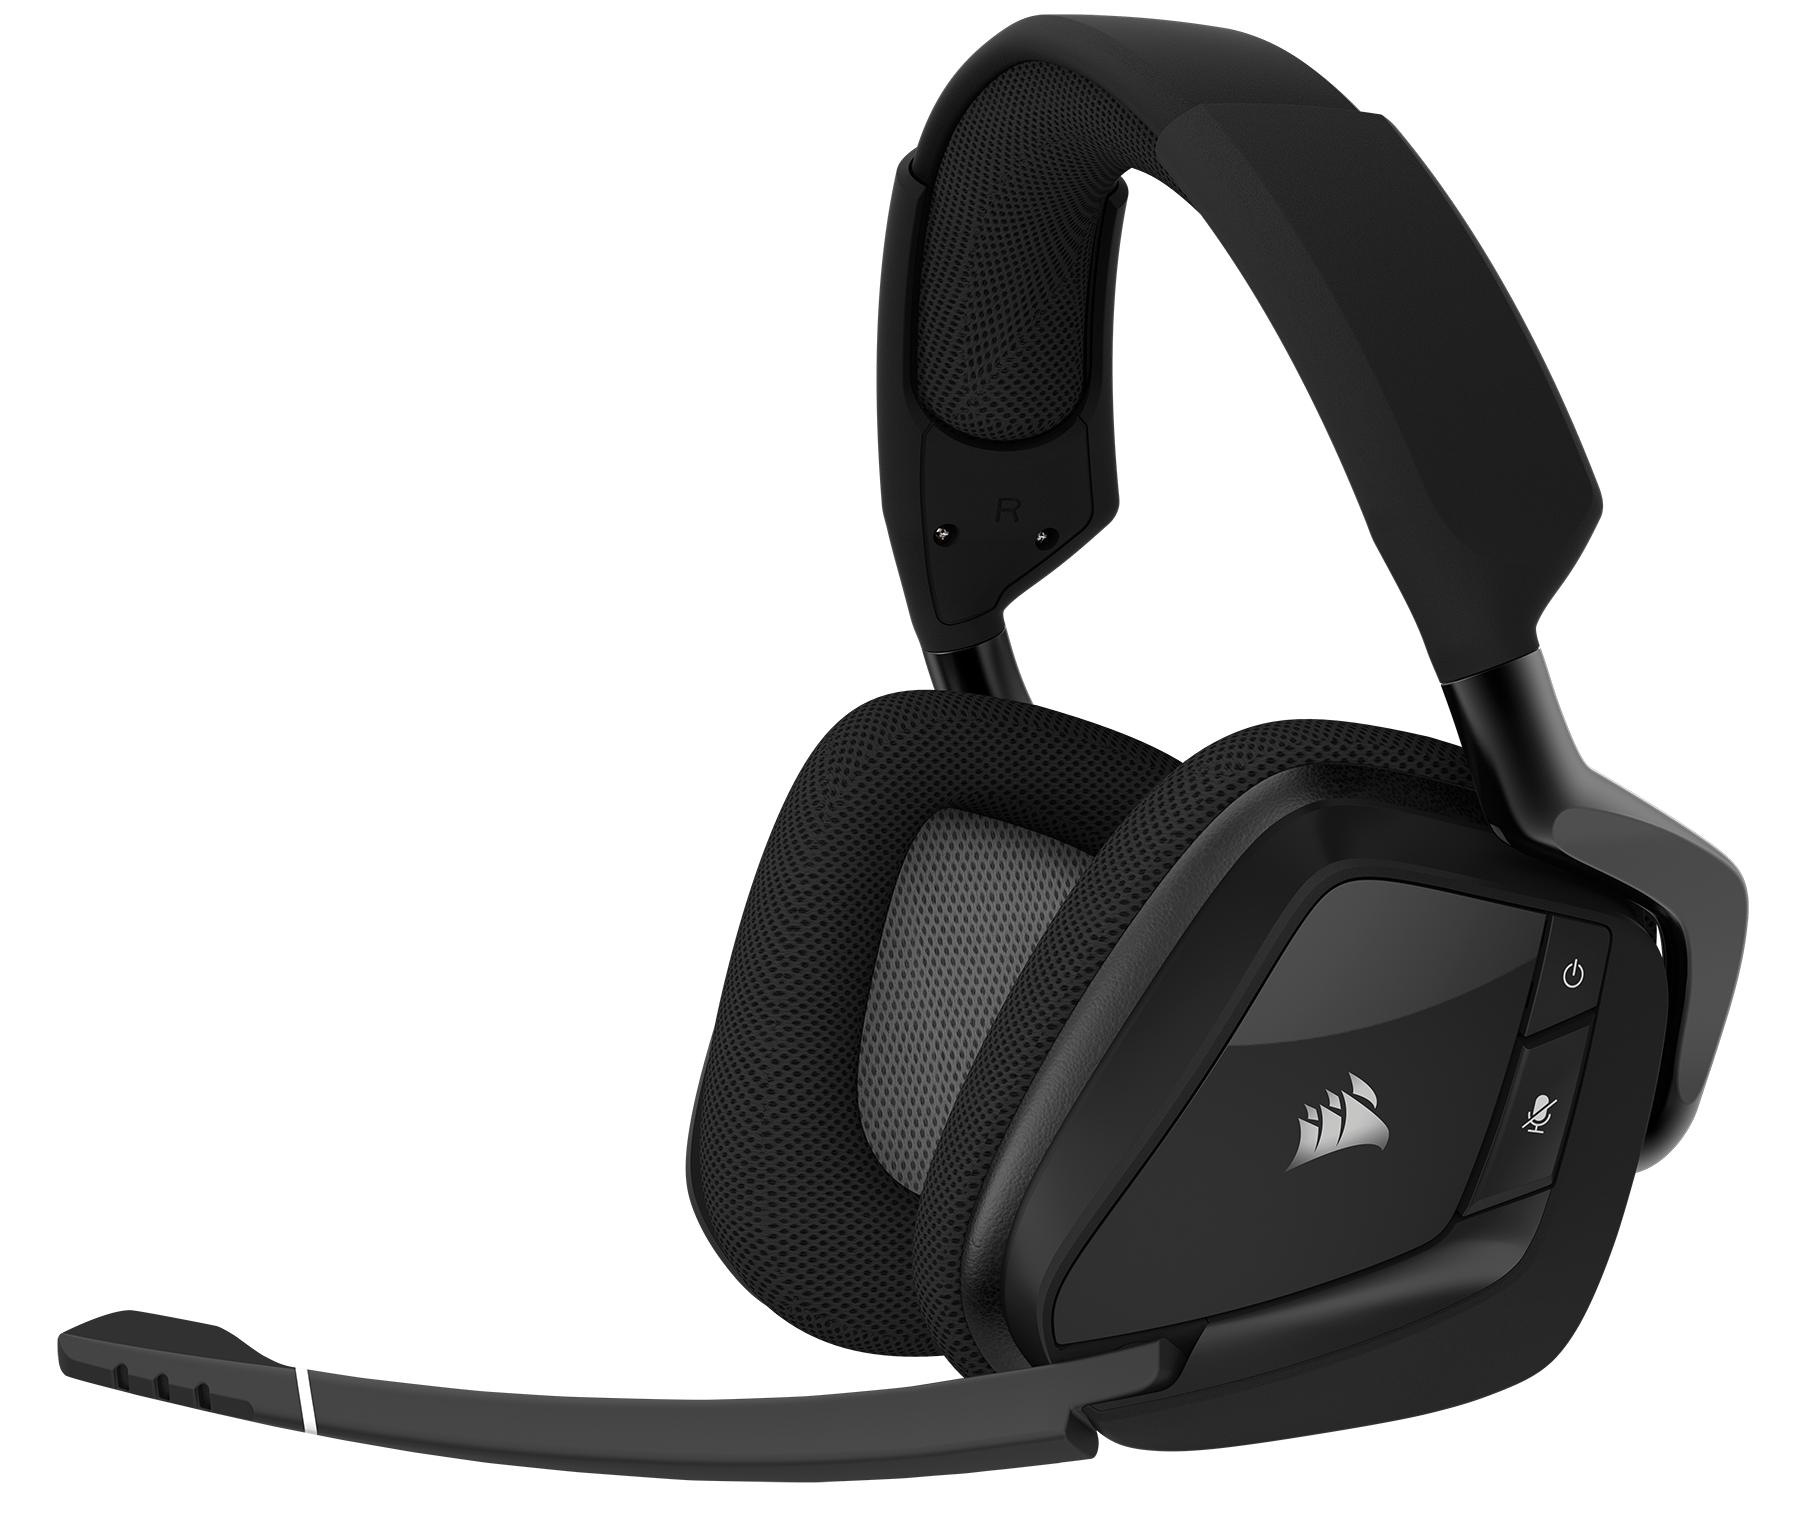 [Amazon.de] Corsair Void Pro RGB Wireless Gaming Headset (PC, Wireless, Dolby 7.1) schwarz